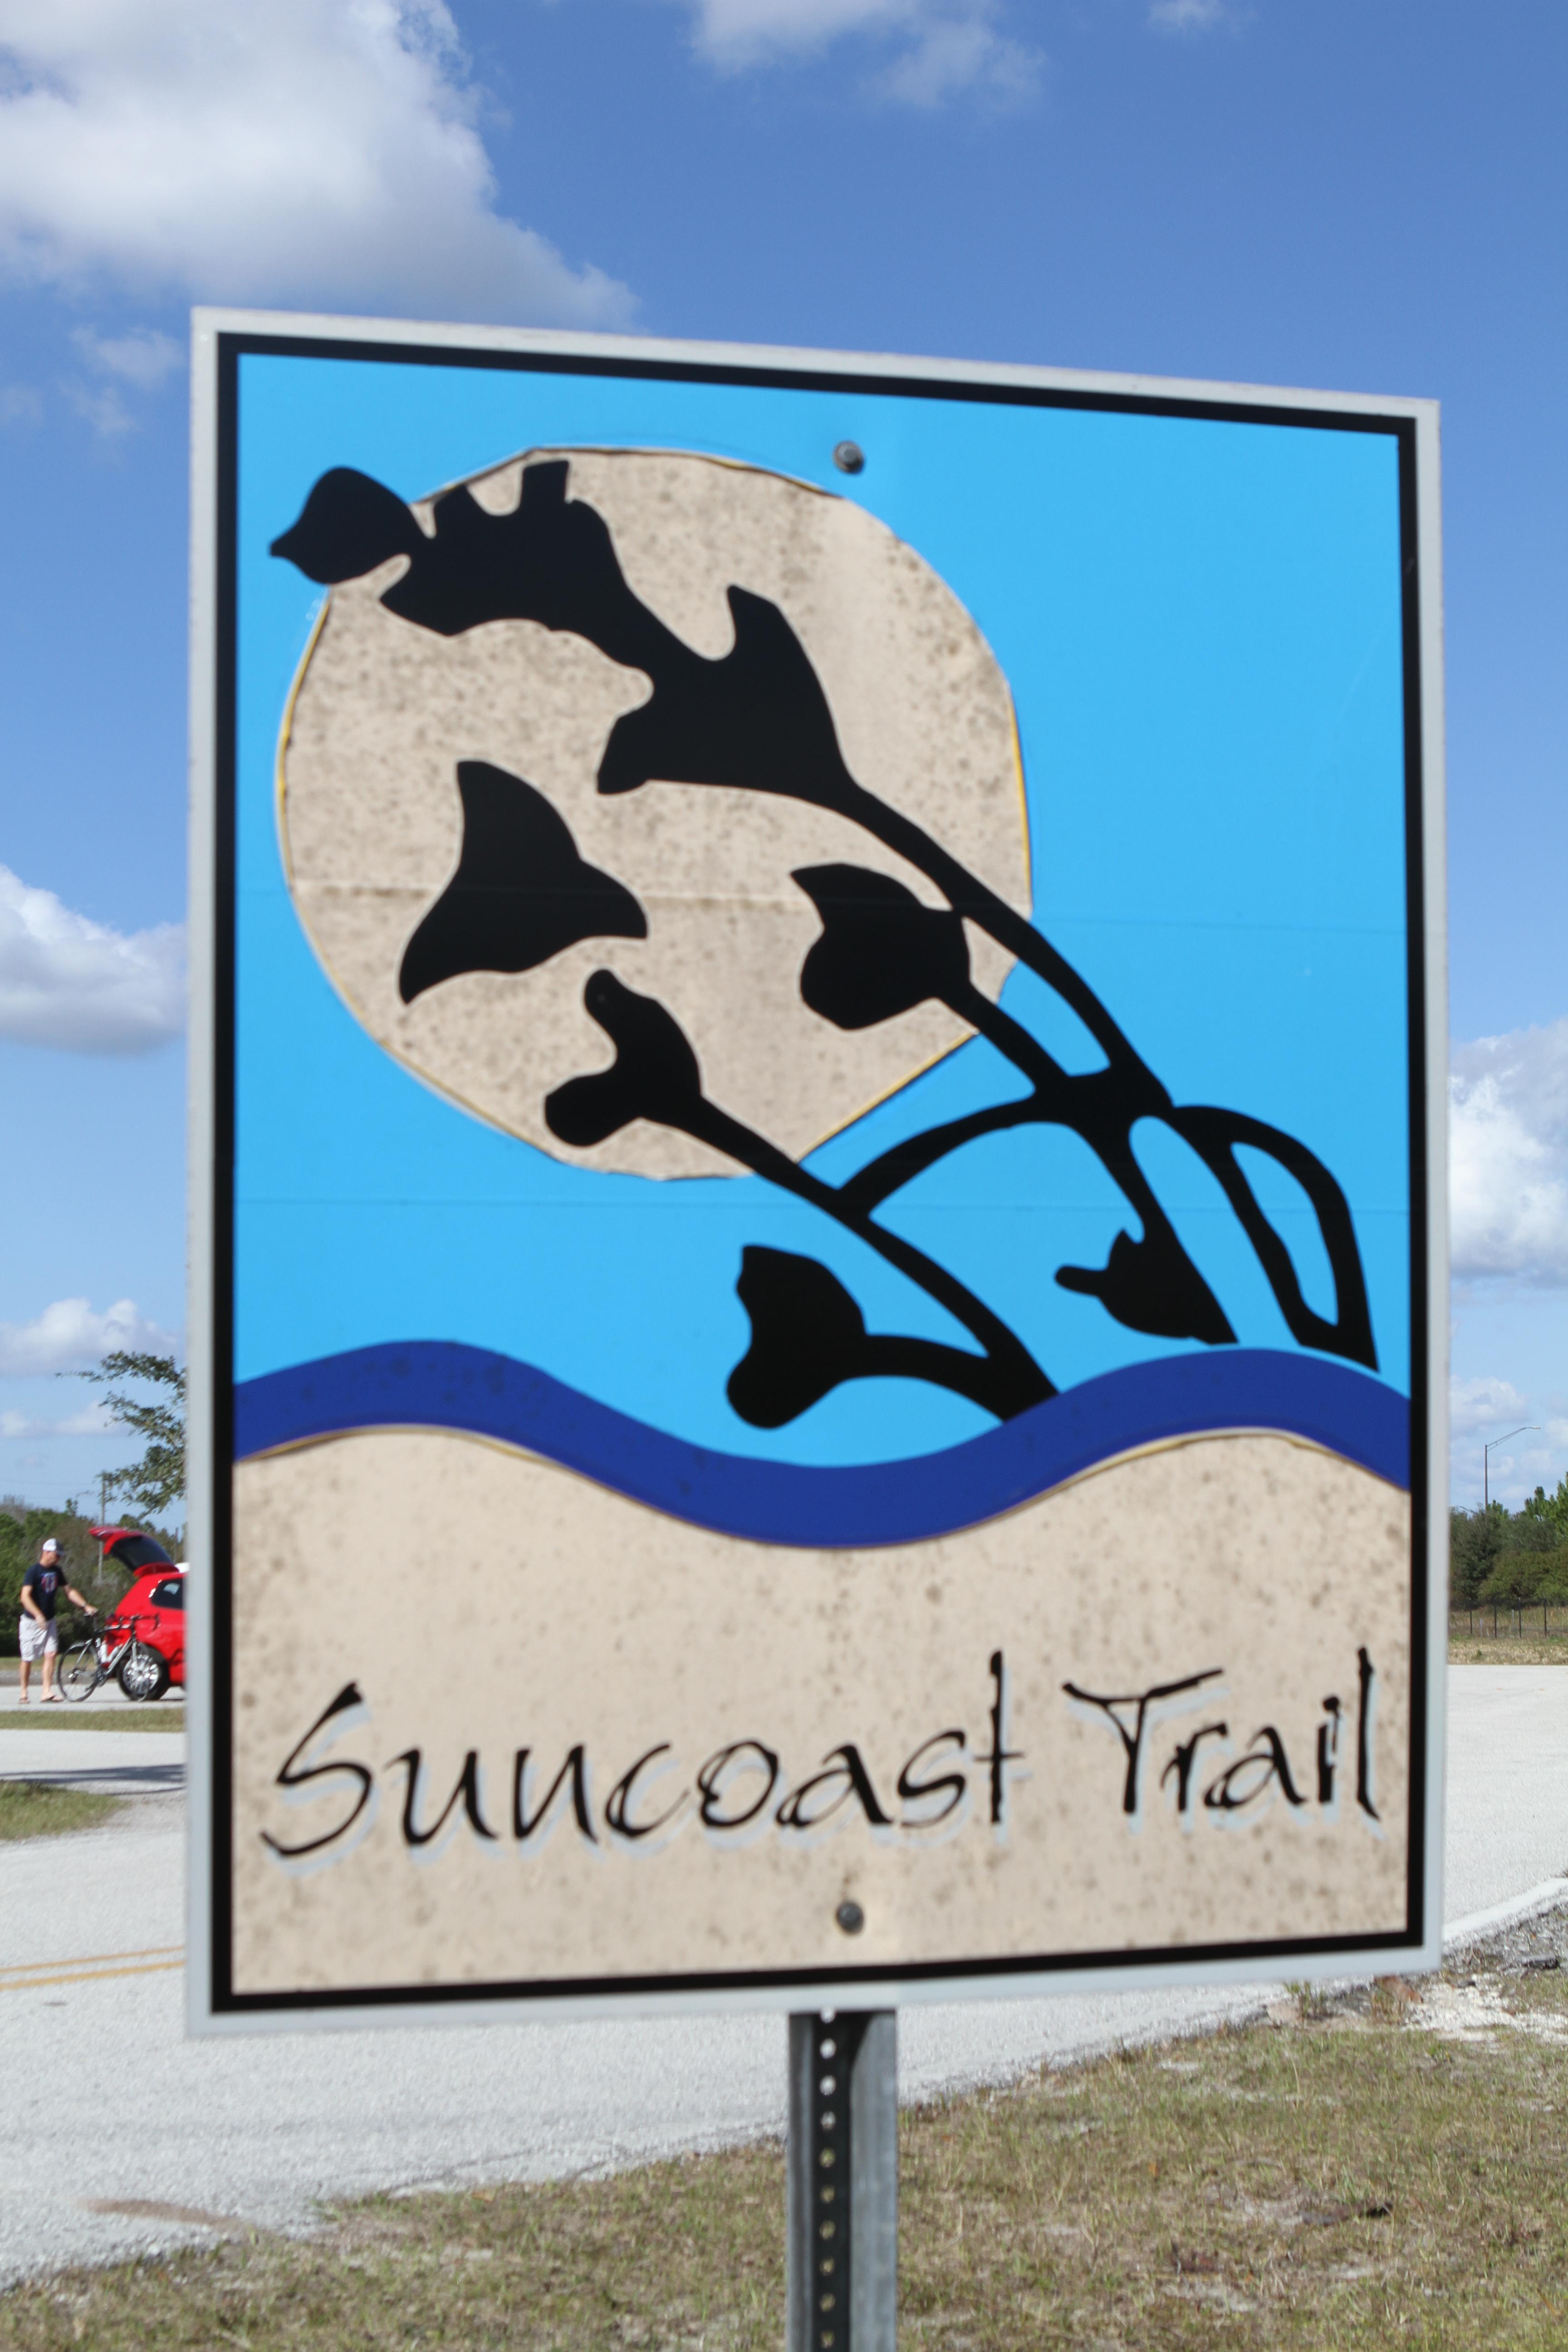 Suncoast trail sign